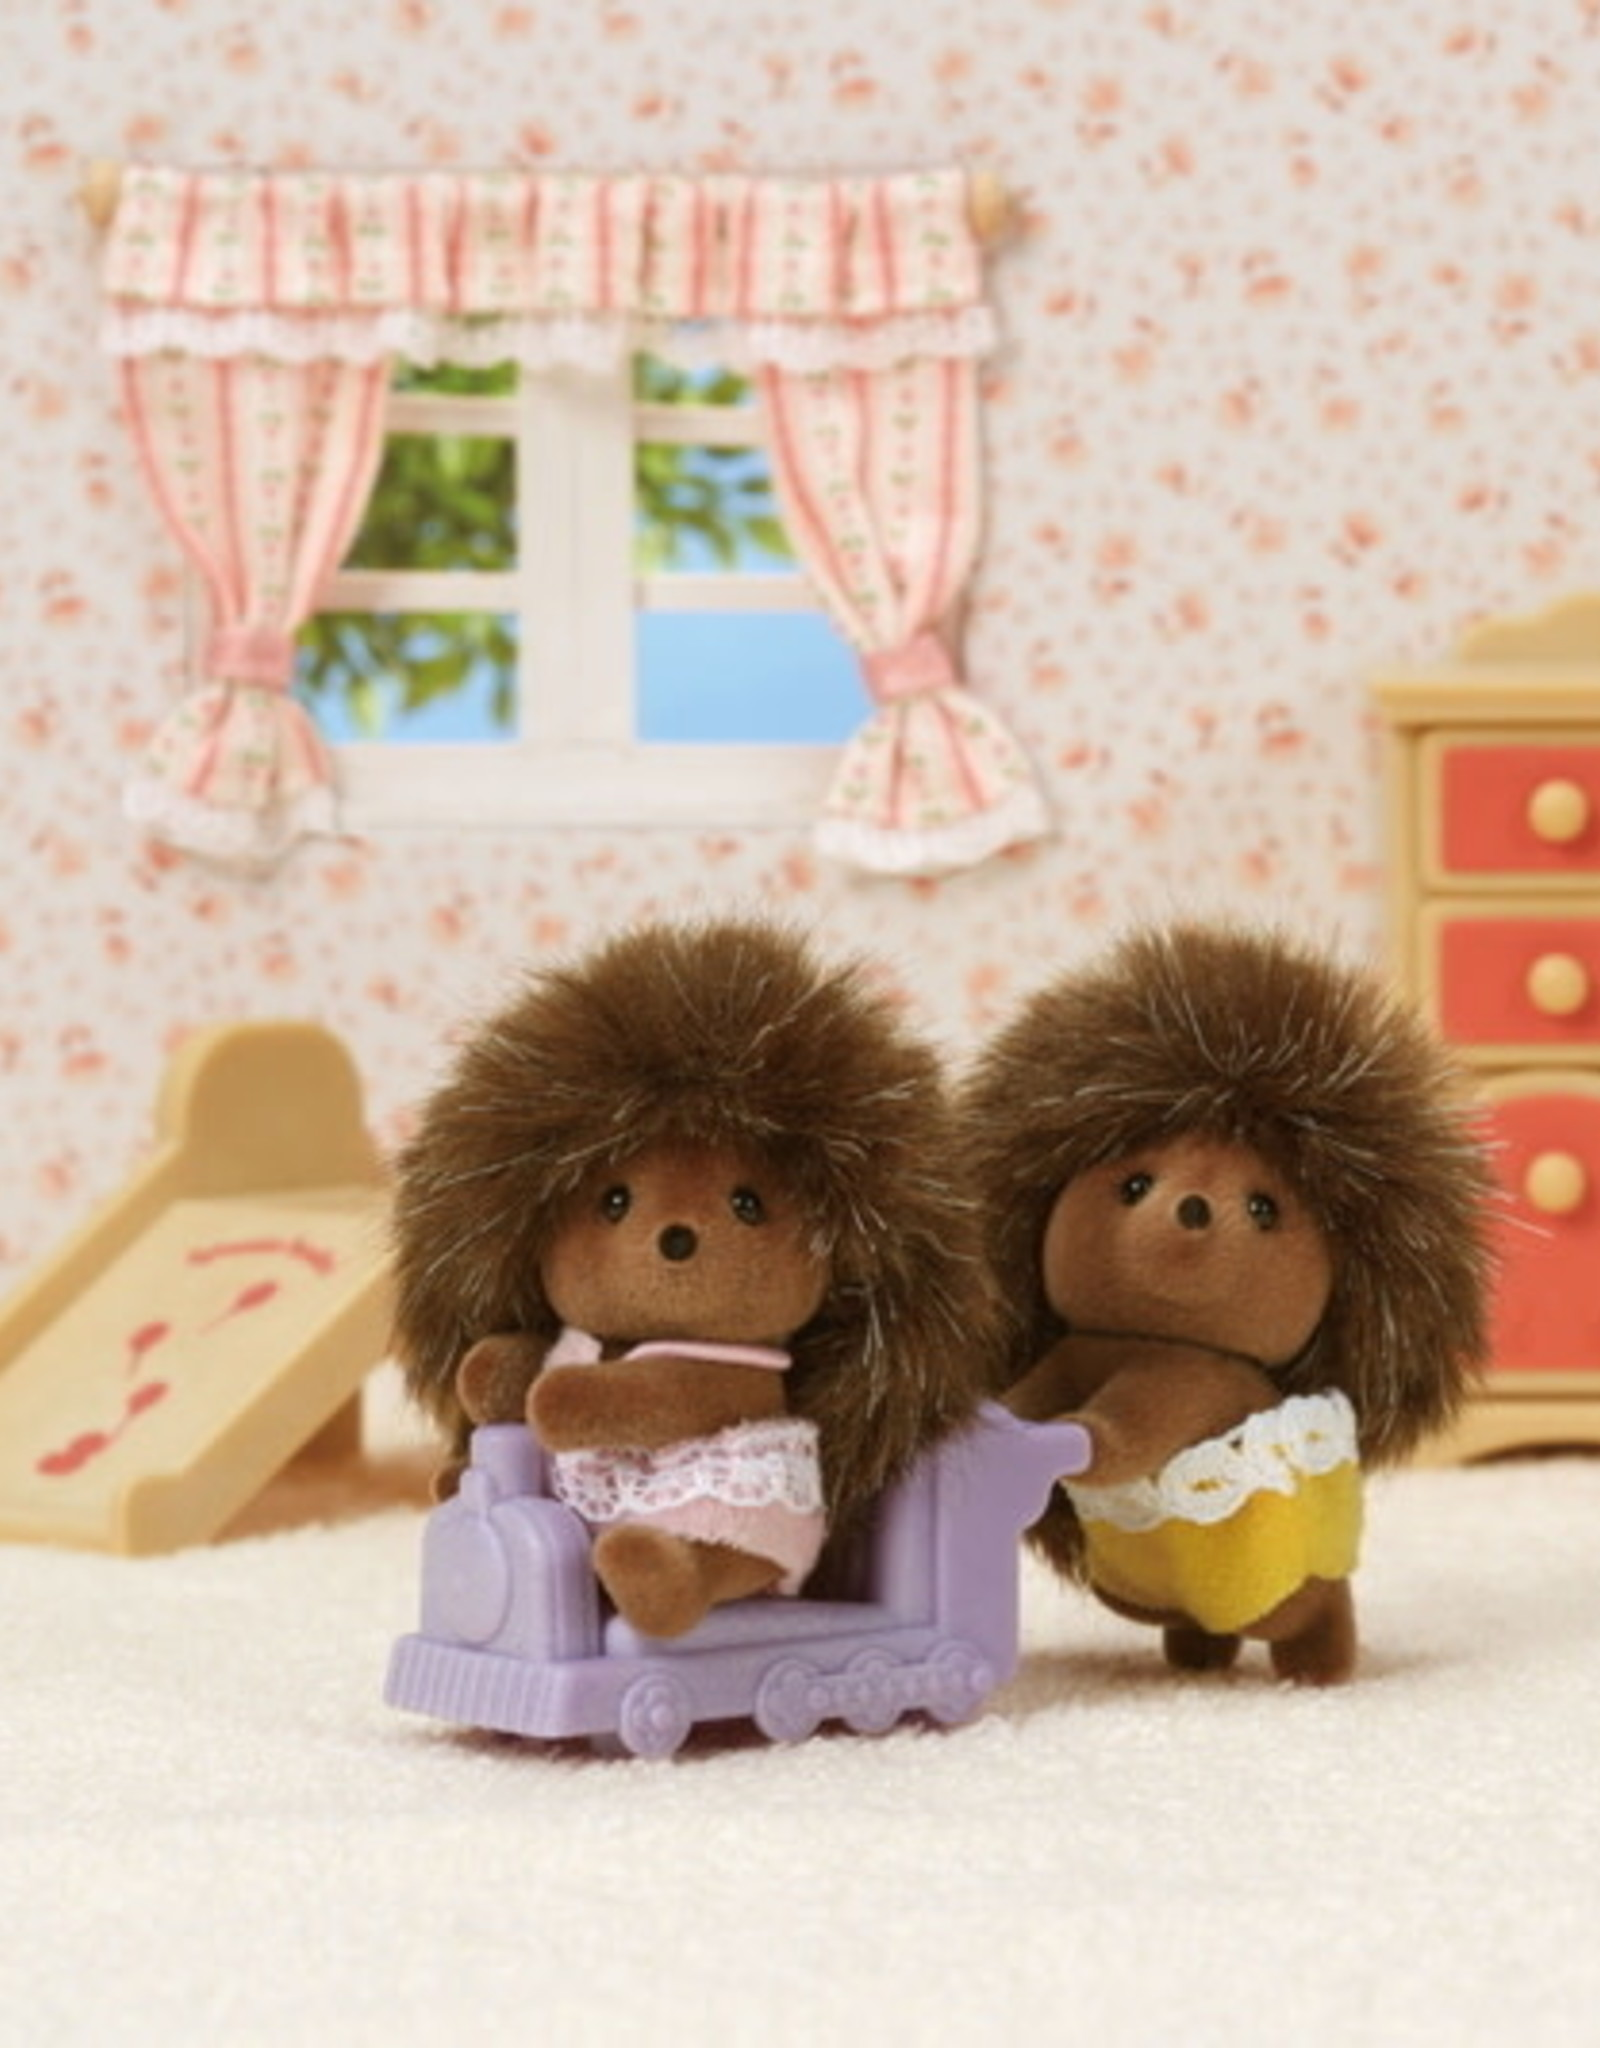 Calico Critters CC Pickleweeds Hedgehog Twins